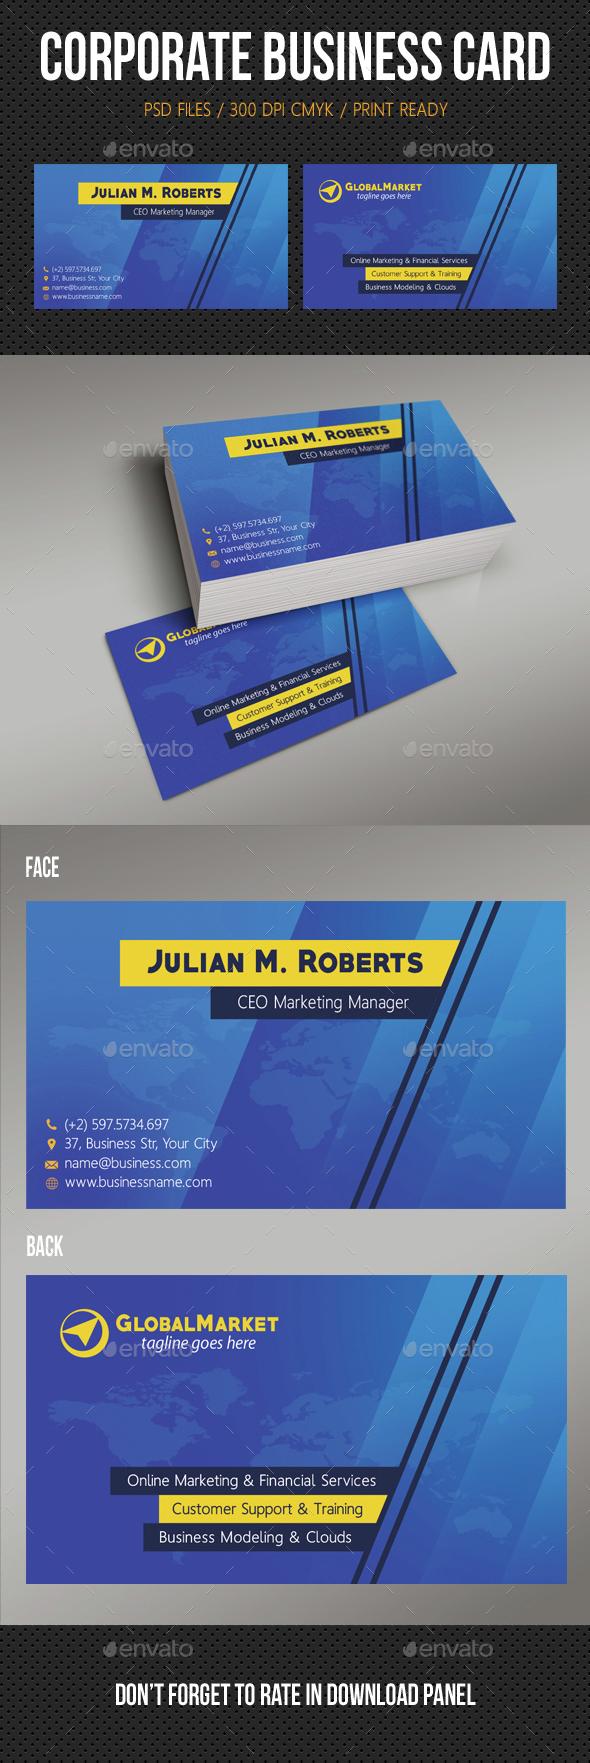 Corporate Business Card 16 - Corporate Business Cards